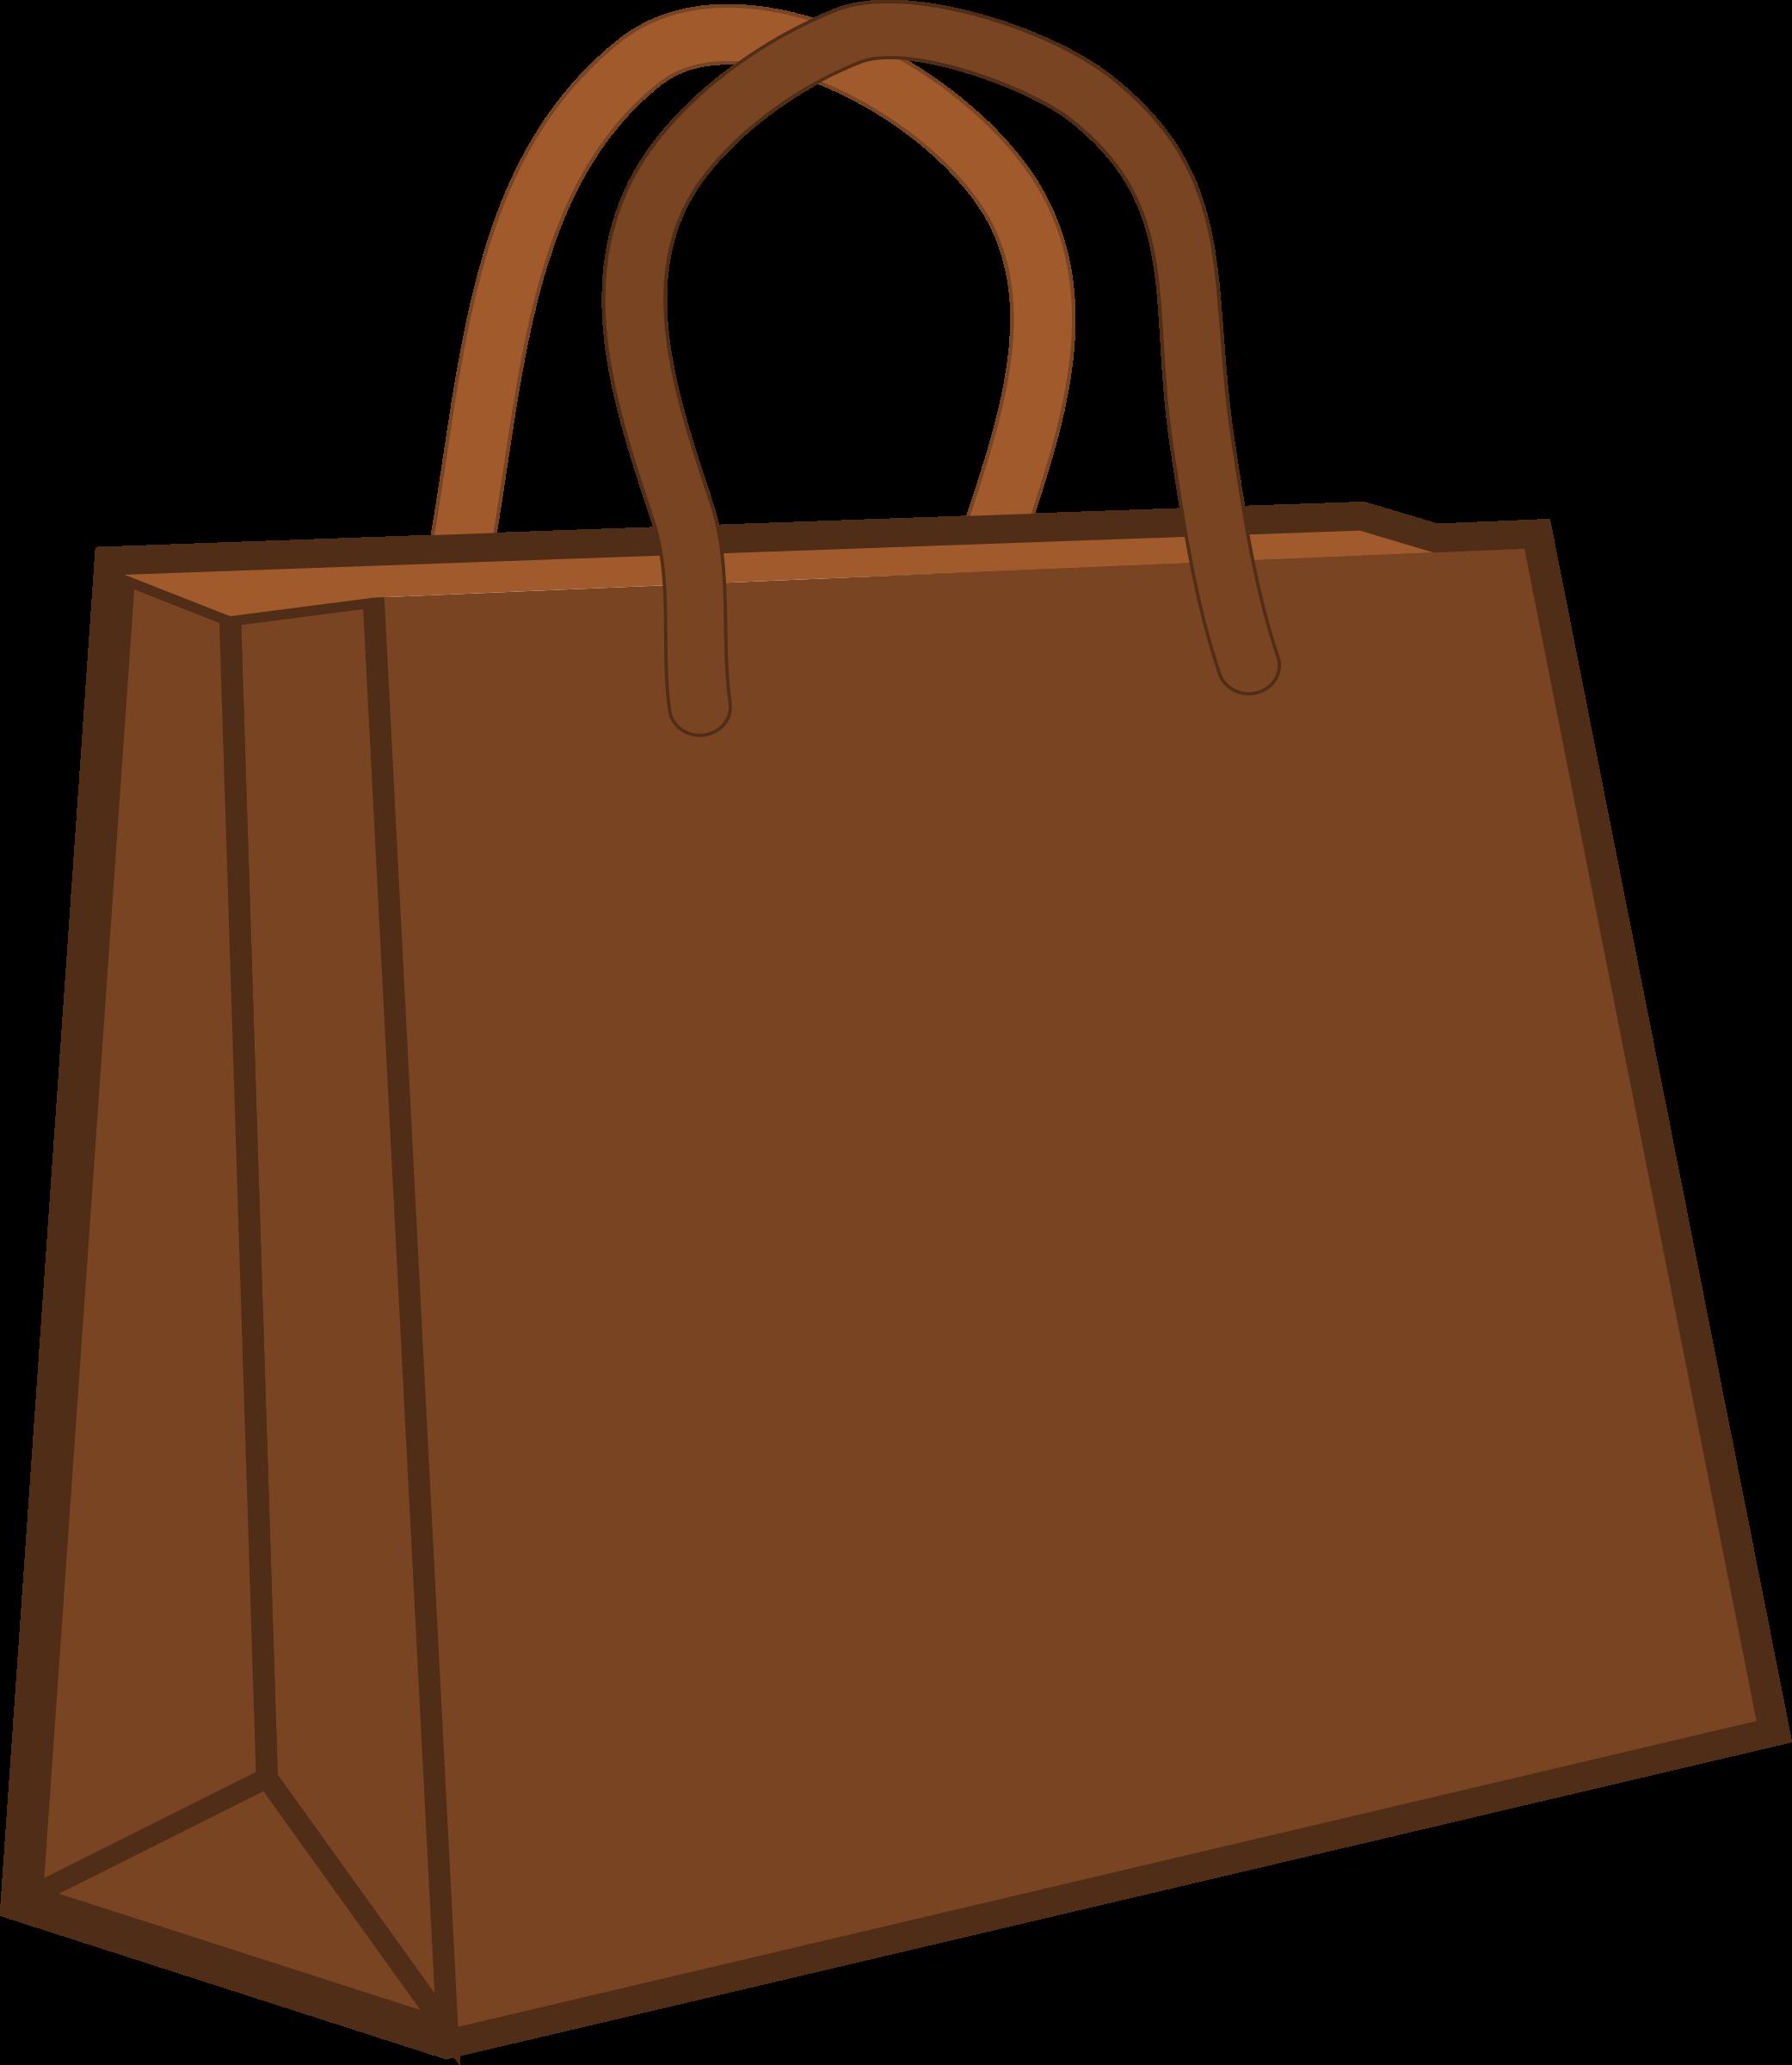 Brown Paper Bag Clipart